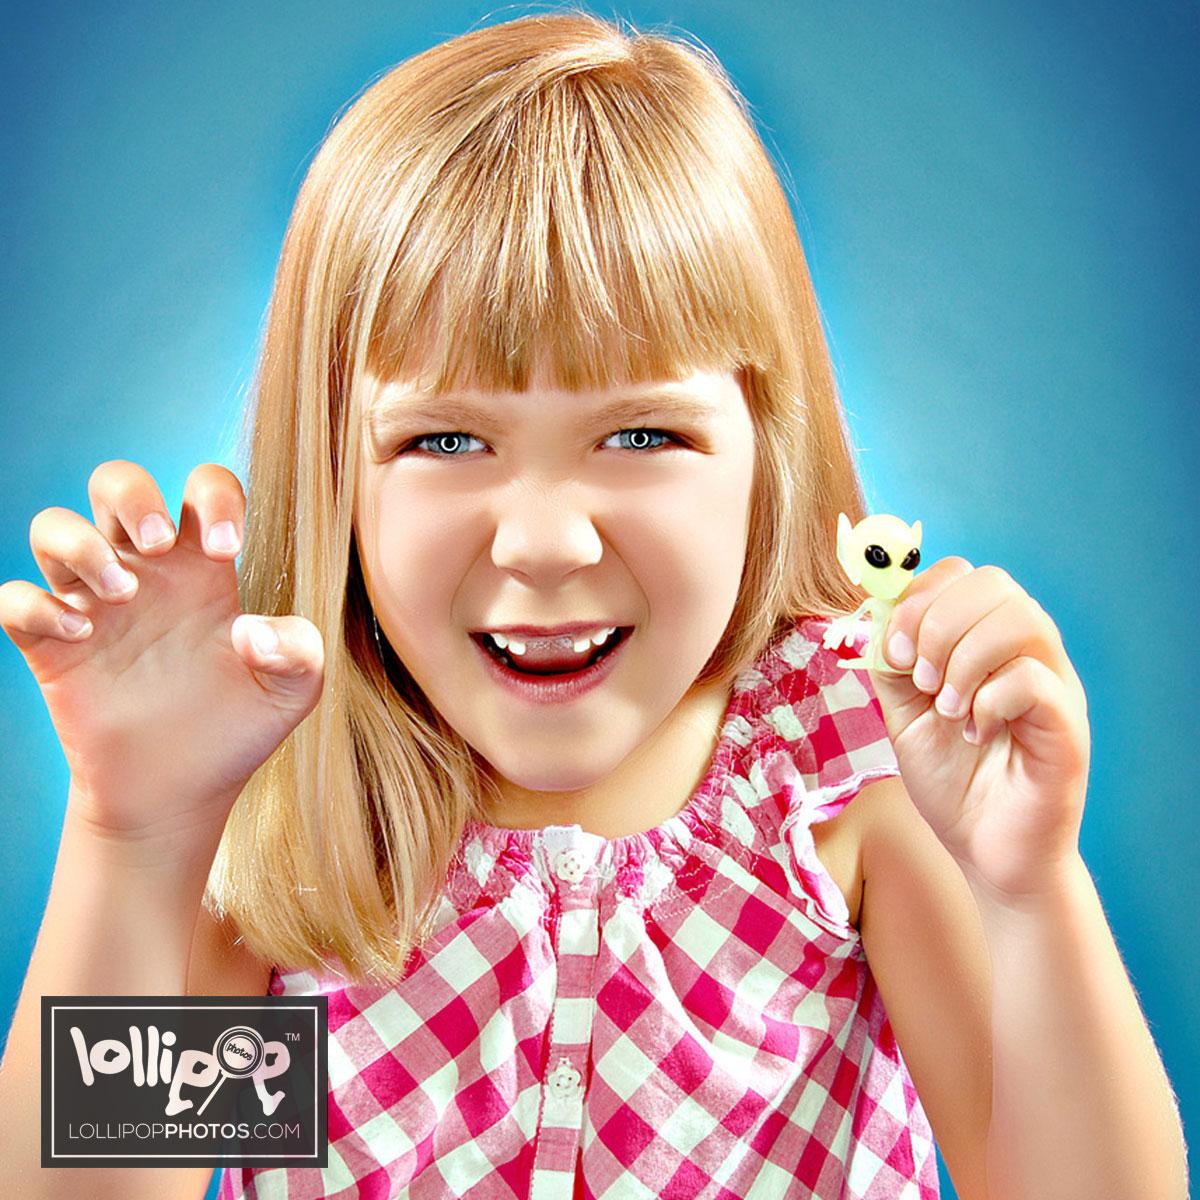 msdig-nora-canfield-lollipop-photos-321.jpg